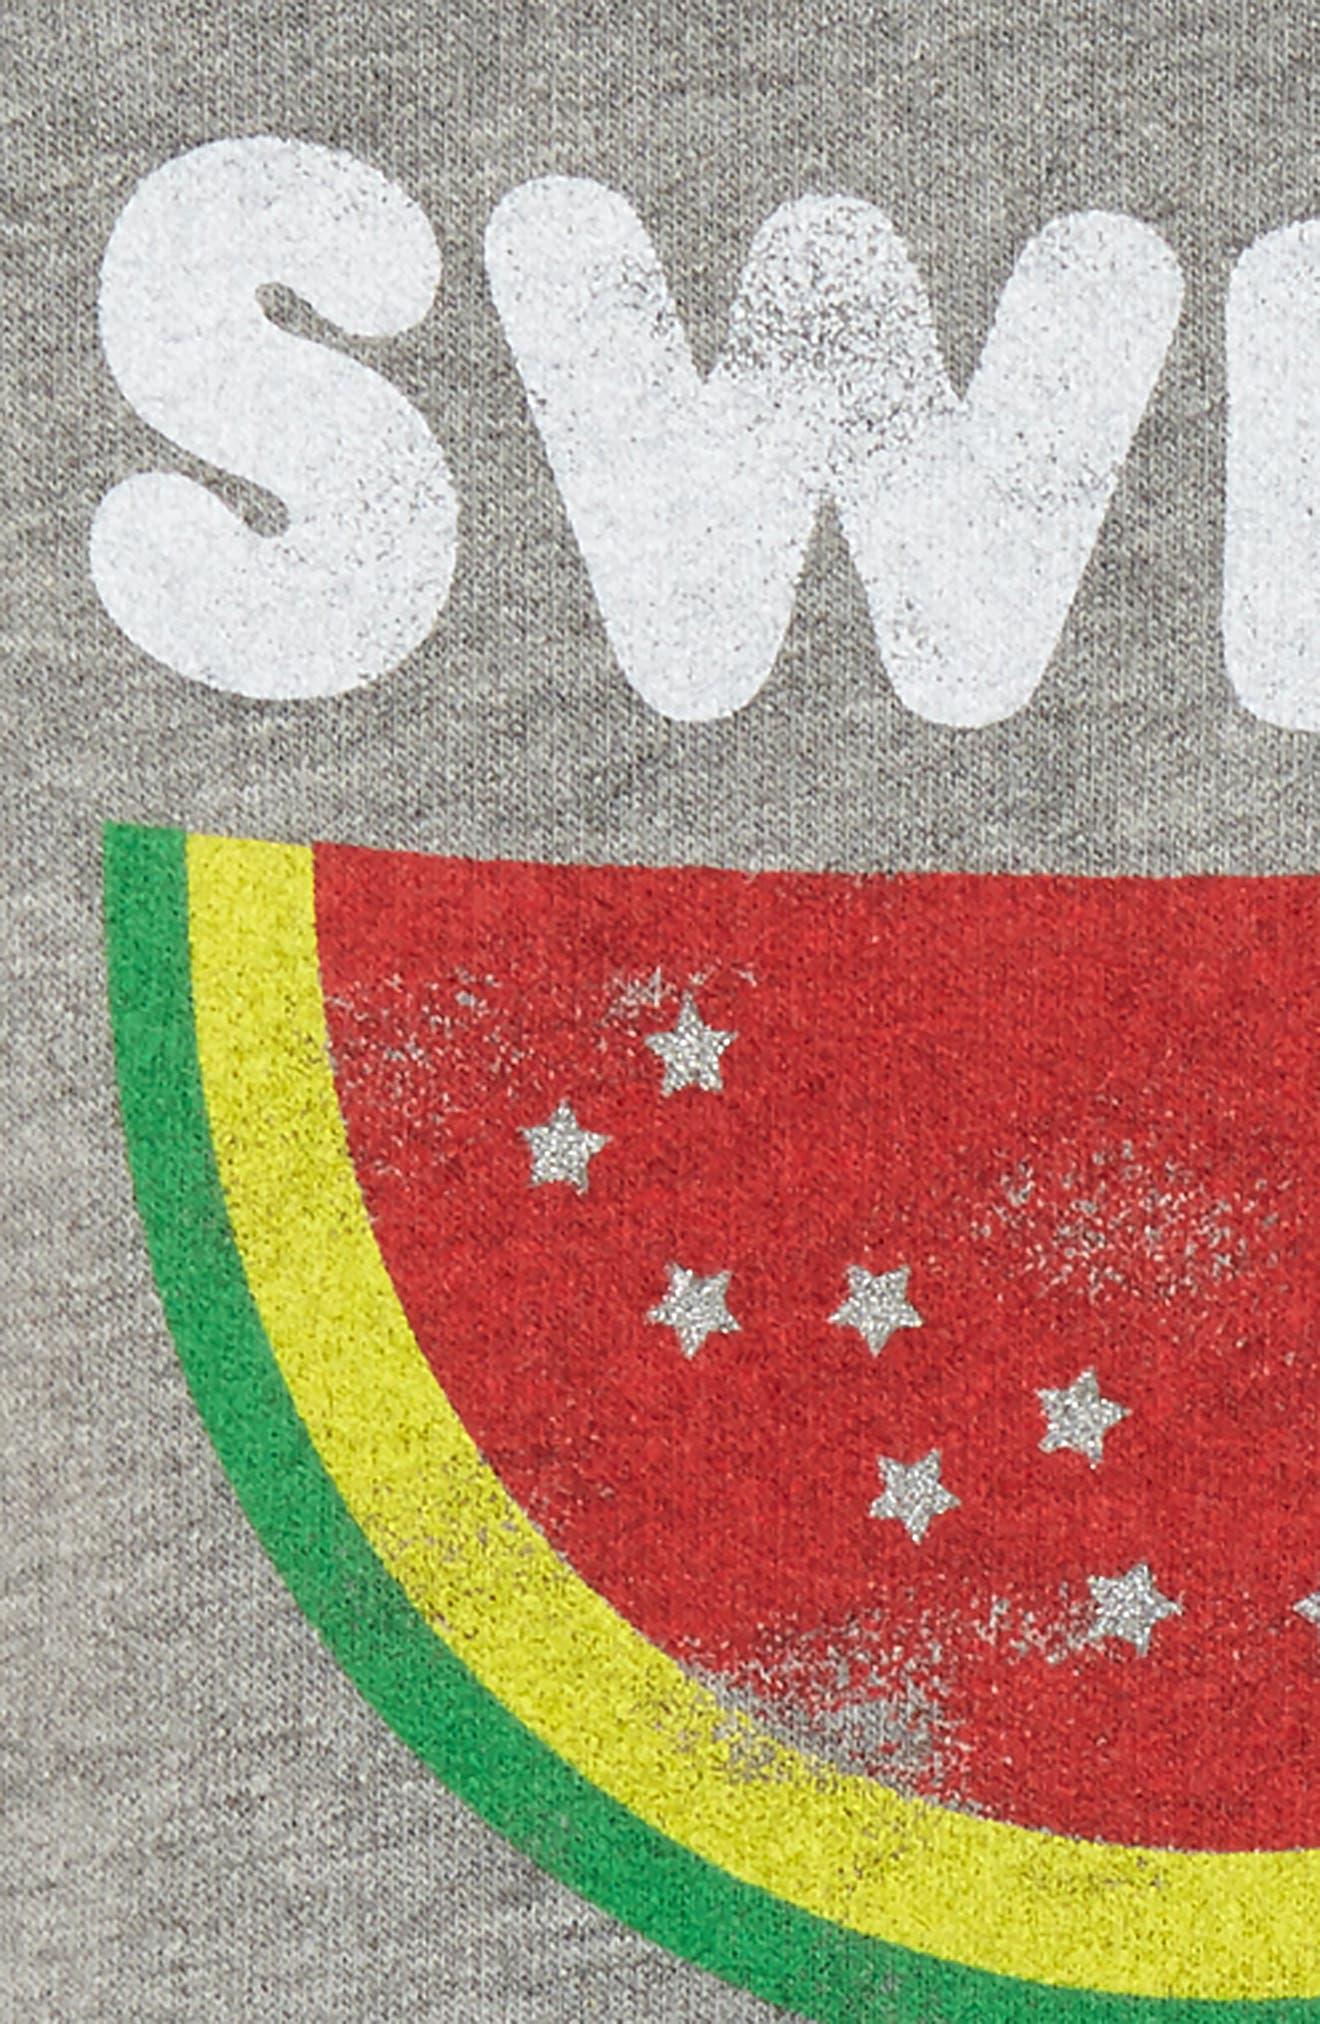 Alternate Image 2  - Peek Sweet Freedom Sweatshirt (Baby)